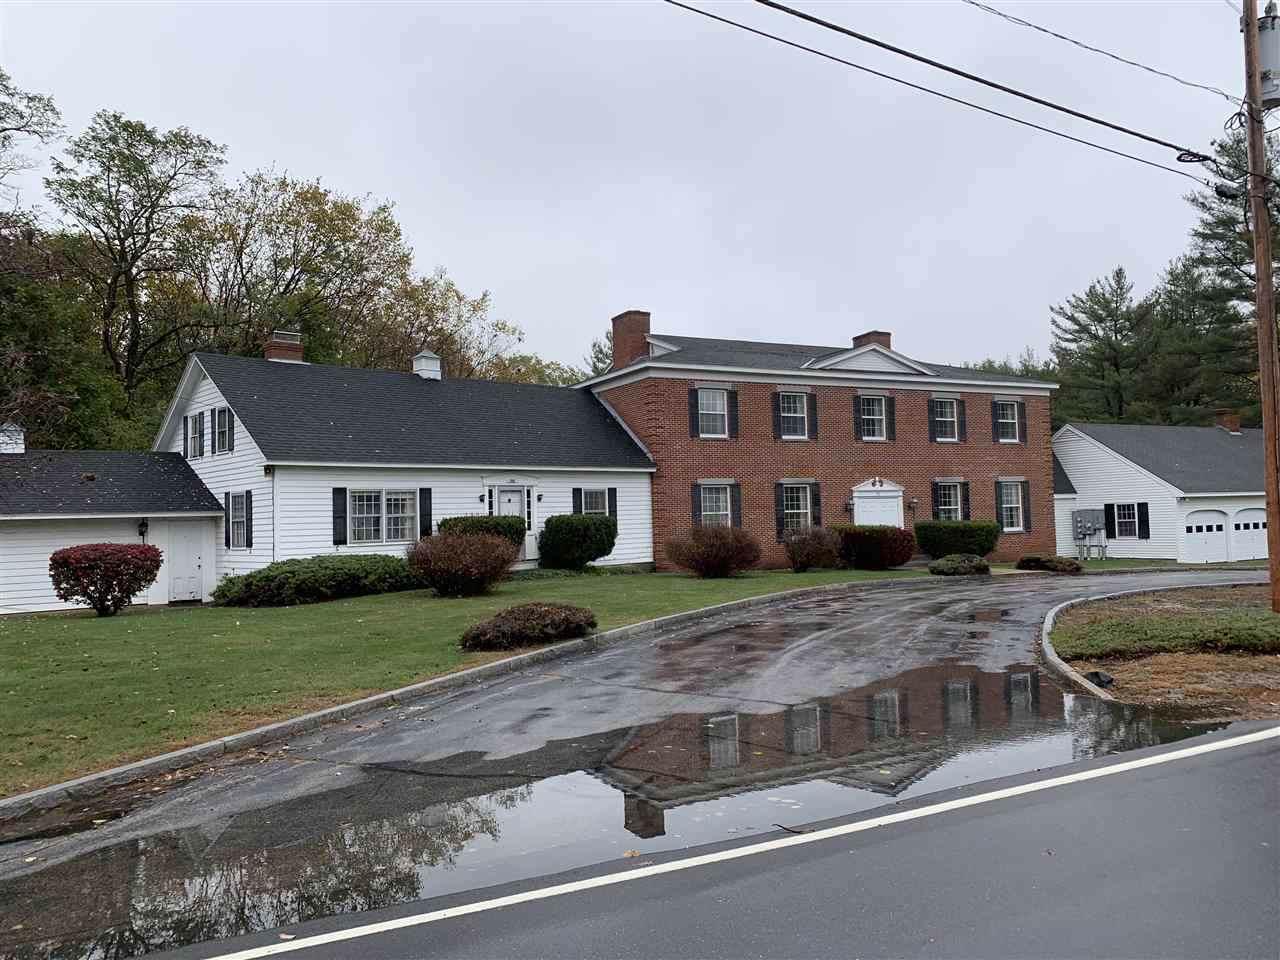 45 Old Granite Road - Photo 1